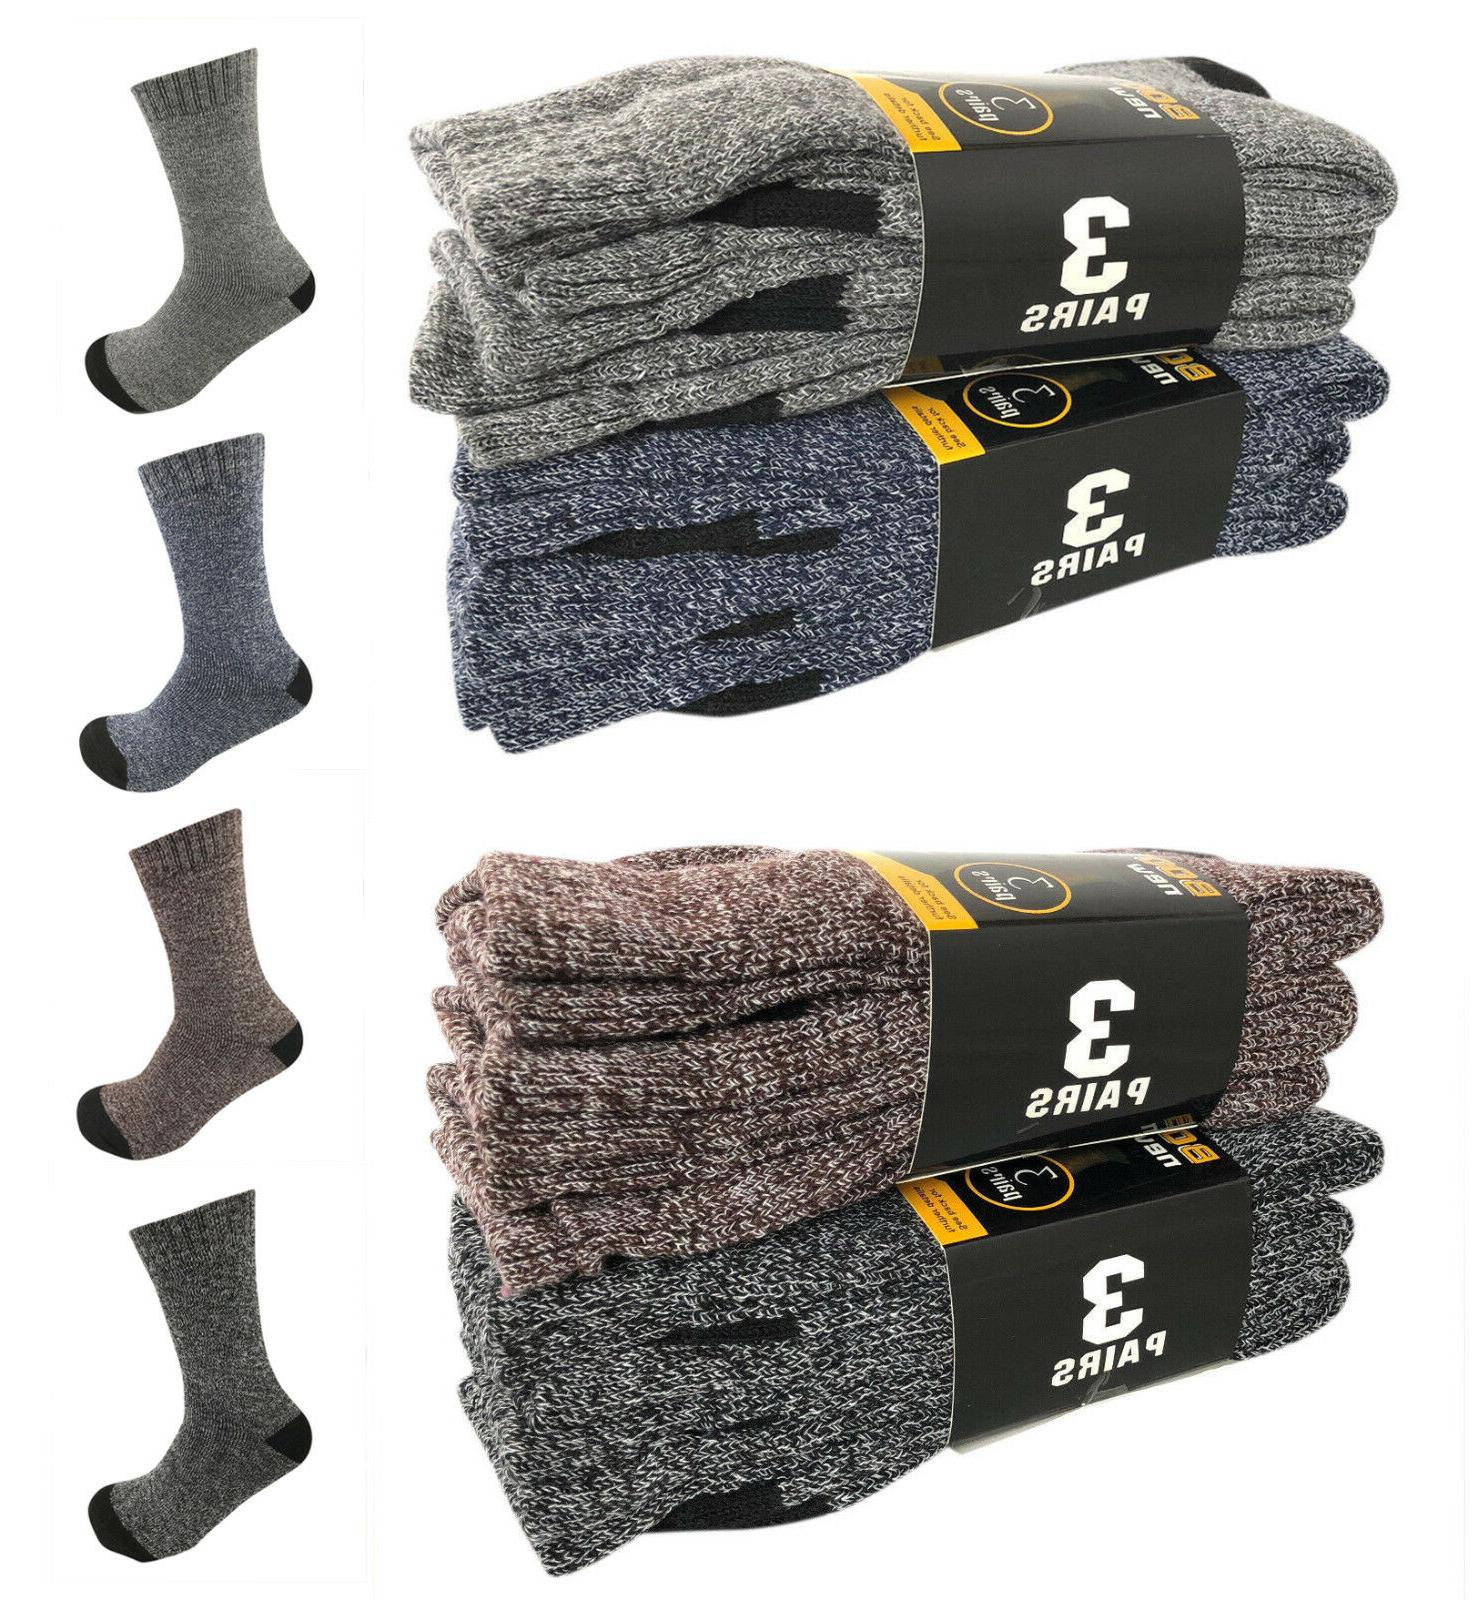 6 pairs men winter warm thermal crew